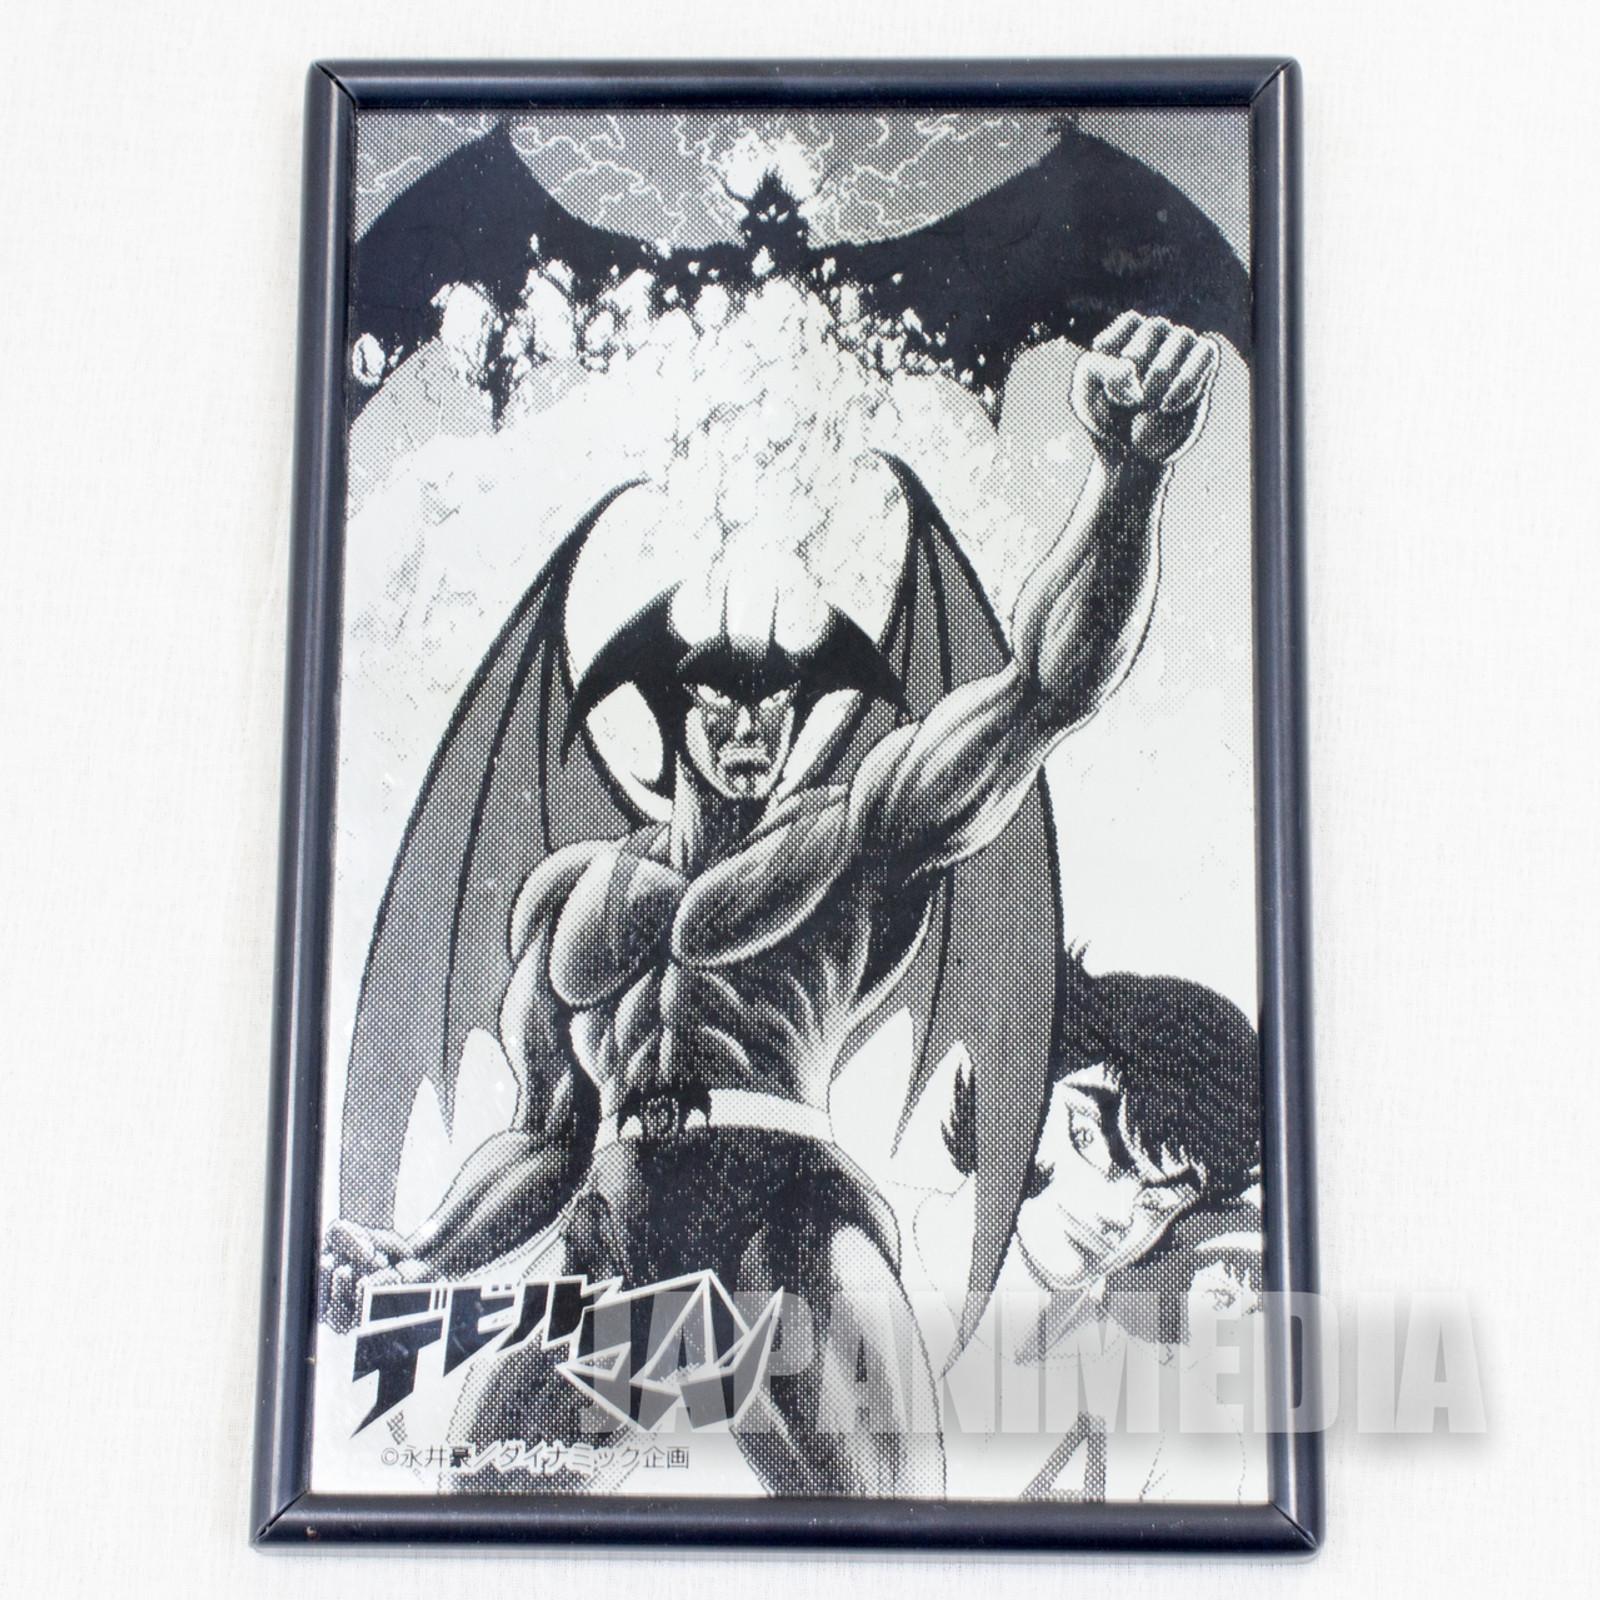 Devilman Desktop Picture Mirror Comic Ver. Go Nagai JAPAN ANIME MANGA 3